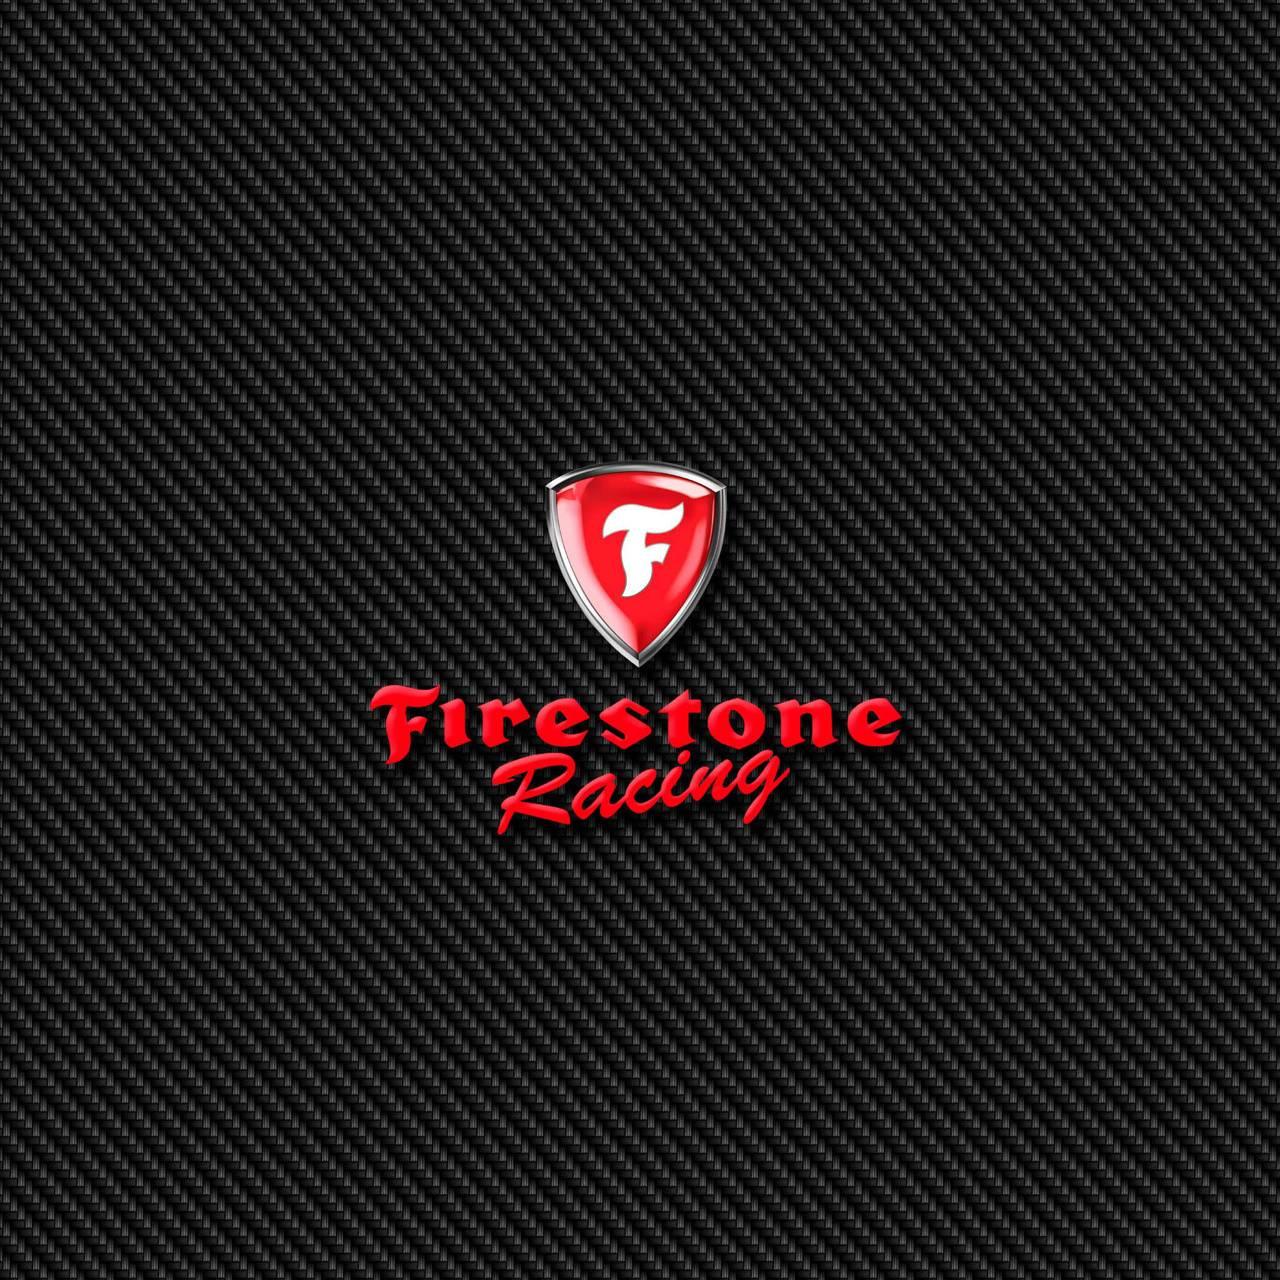 Firestone Carbon